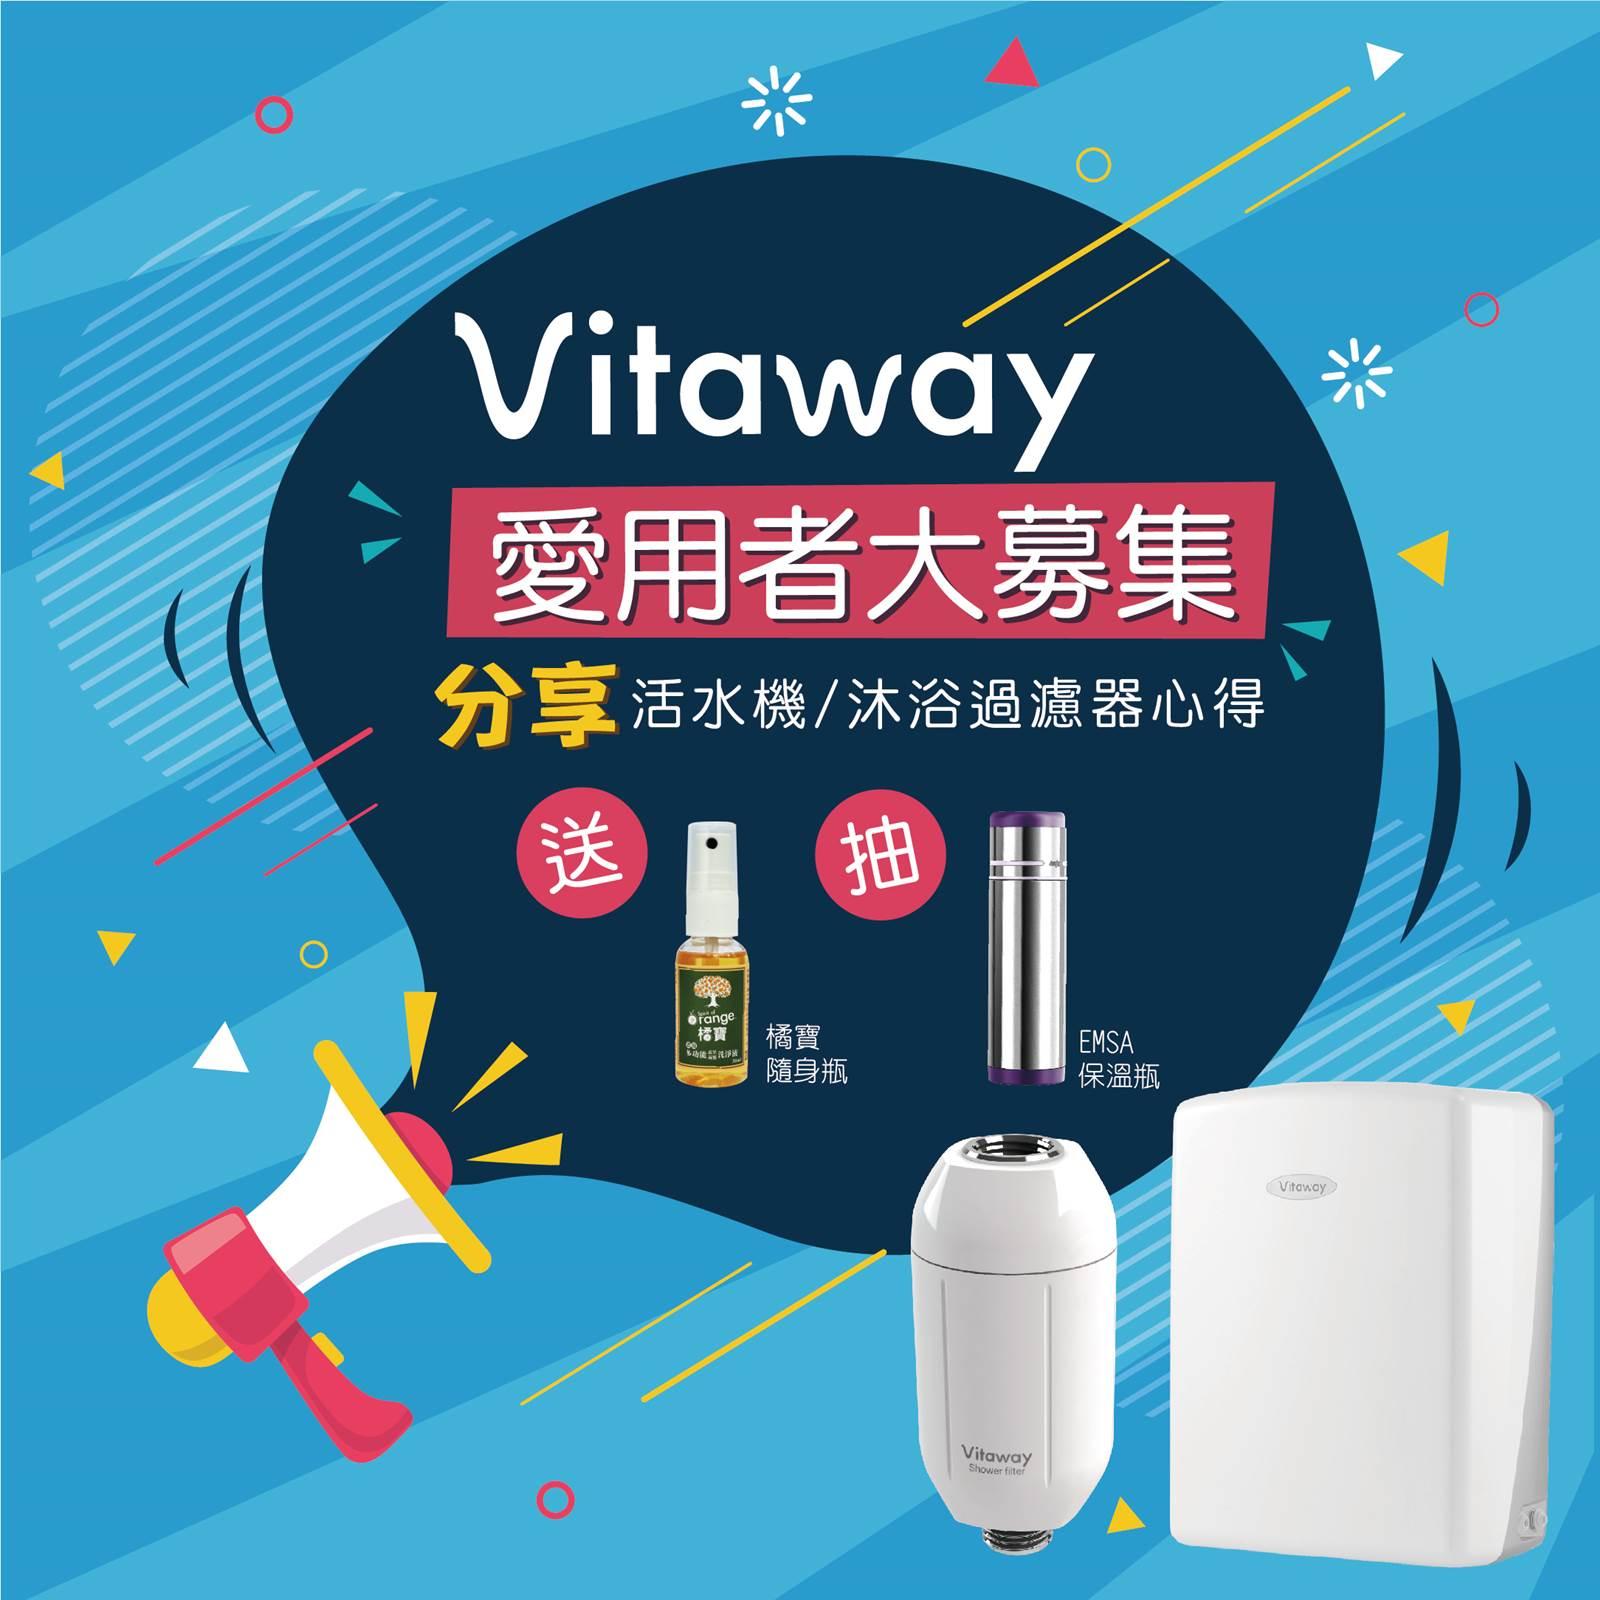 Vitaway愛用者大募集-活水機-沐浴器-心得分享抽獎-2020